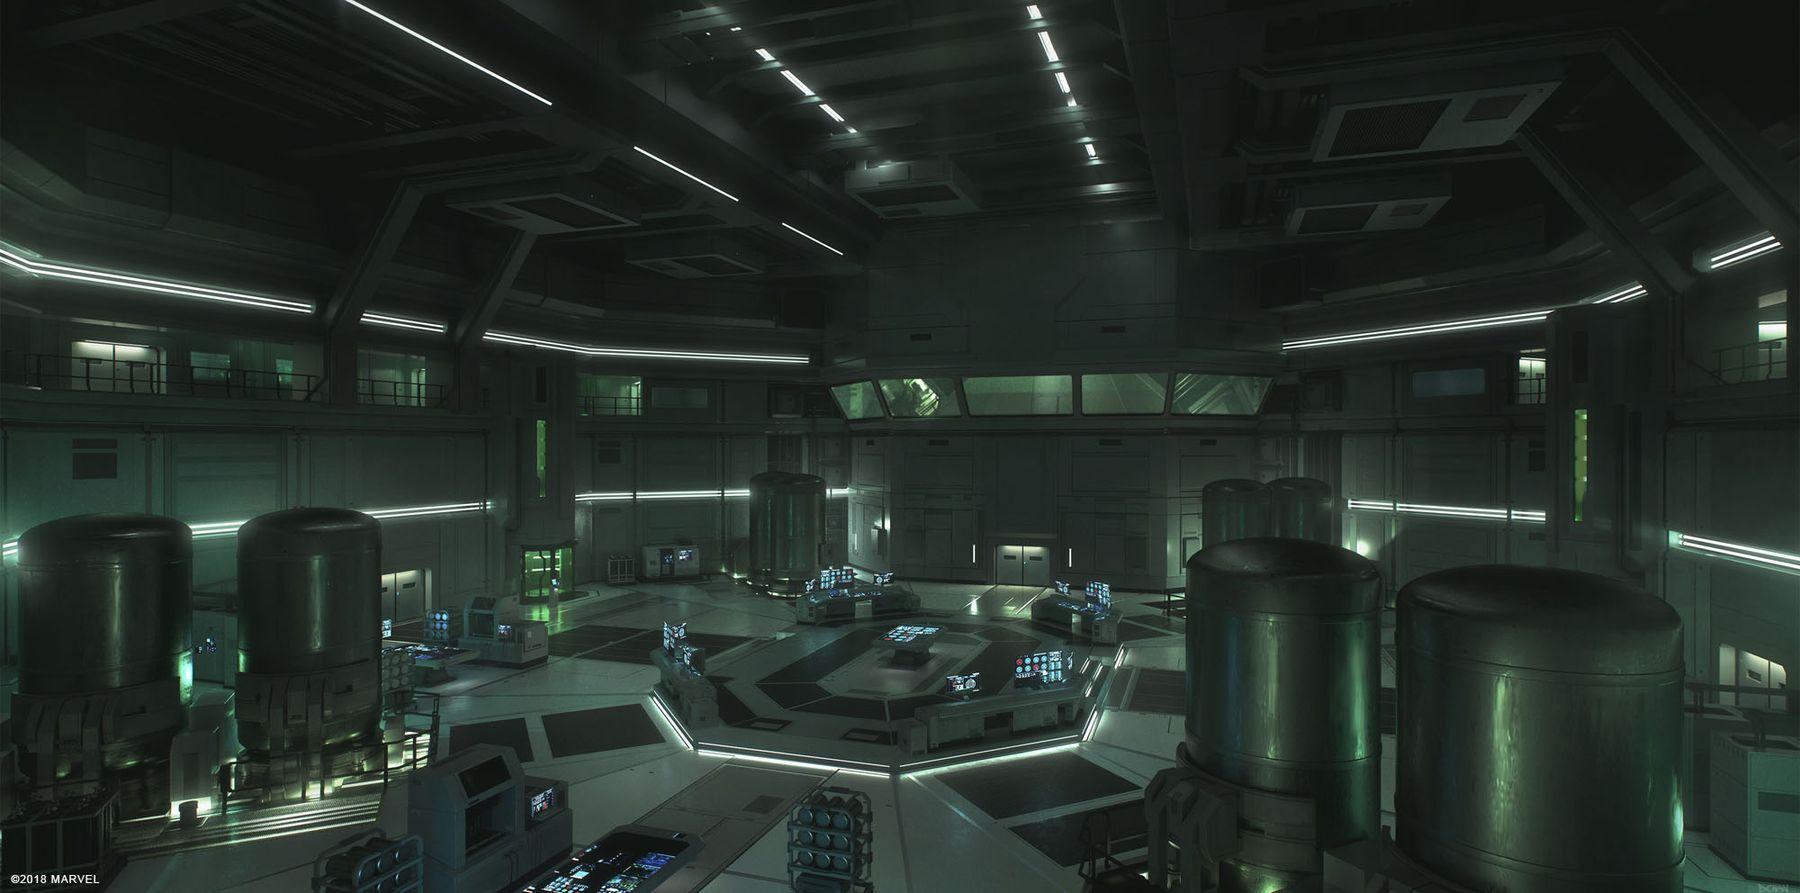 http://conceptartworld.com/wp-content/uploads/2019/01/Spider-Man-PS4-Game-Concept-Art-Dennis-Chan-Arena_Interior_Concept_Final_v01.jpg